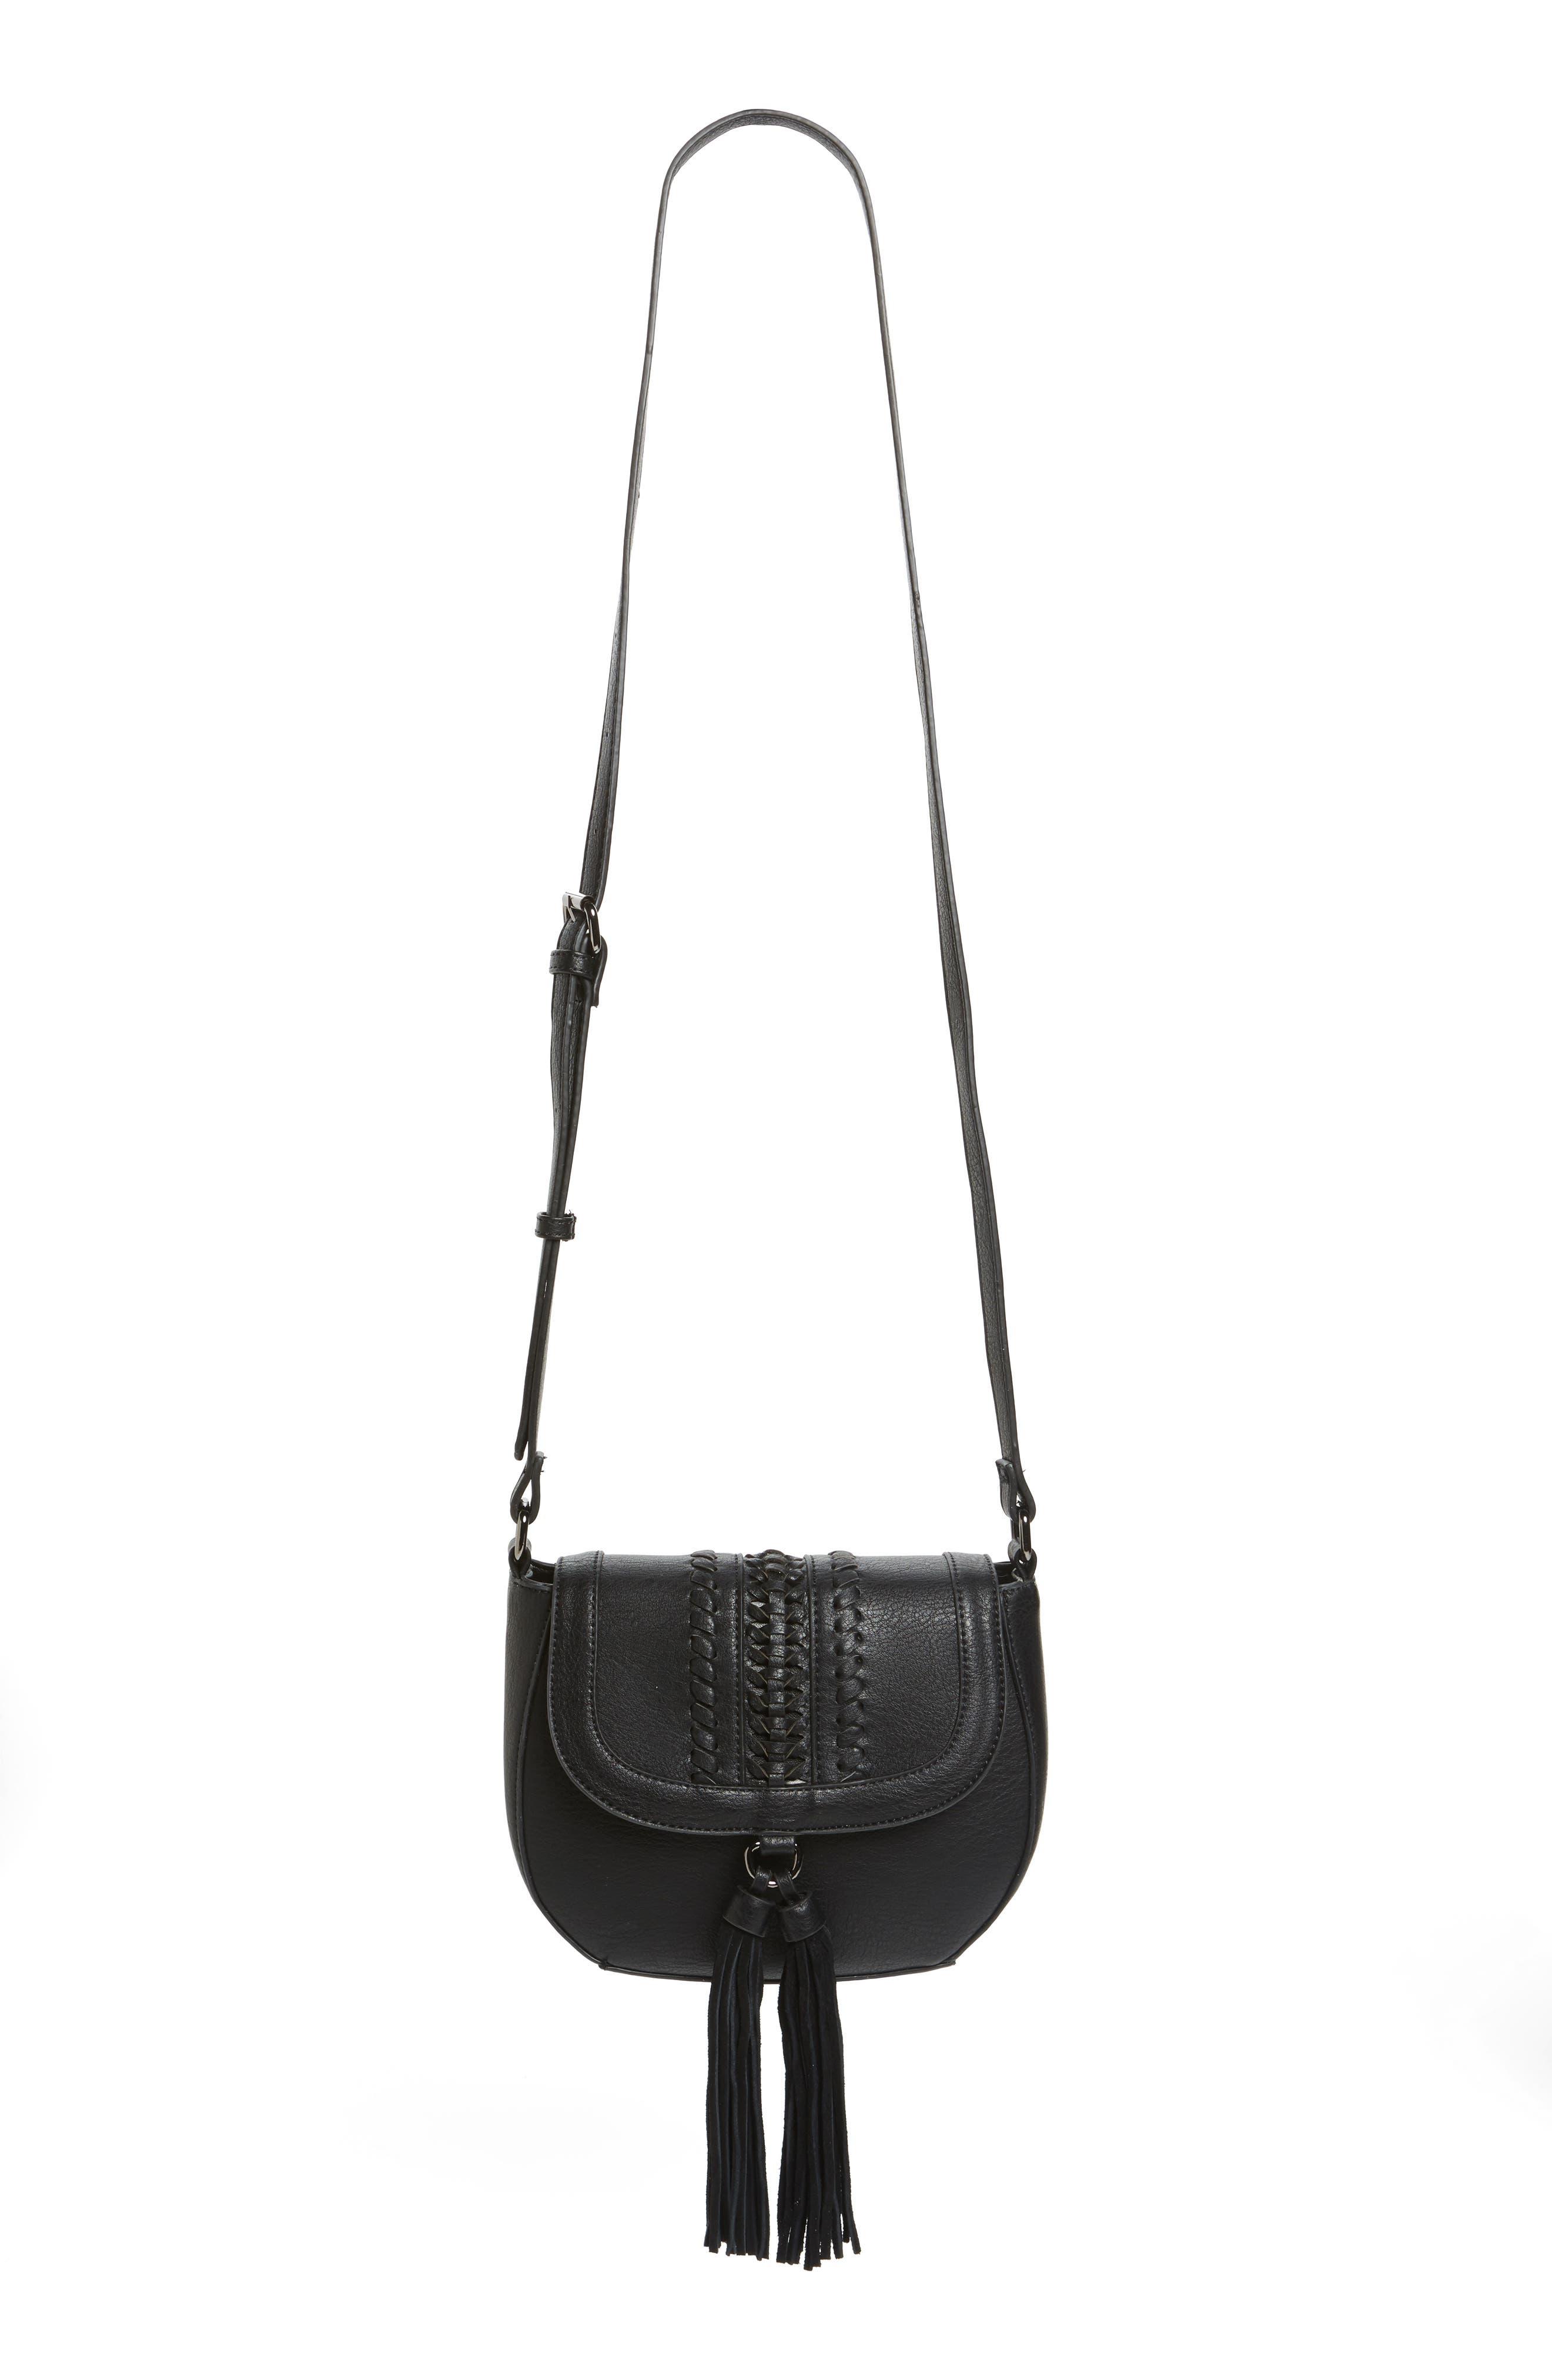 Main Image - Phase 3 Tassel Crossbody Bag